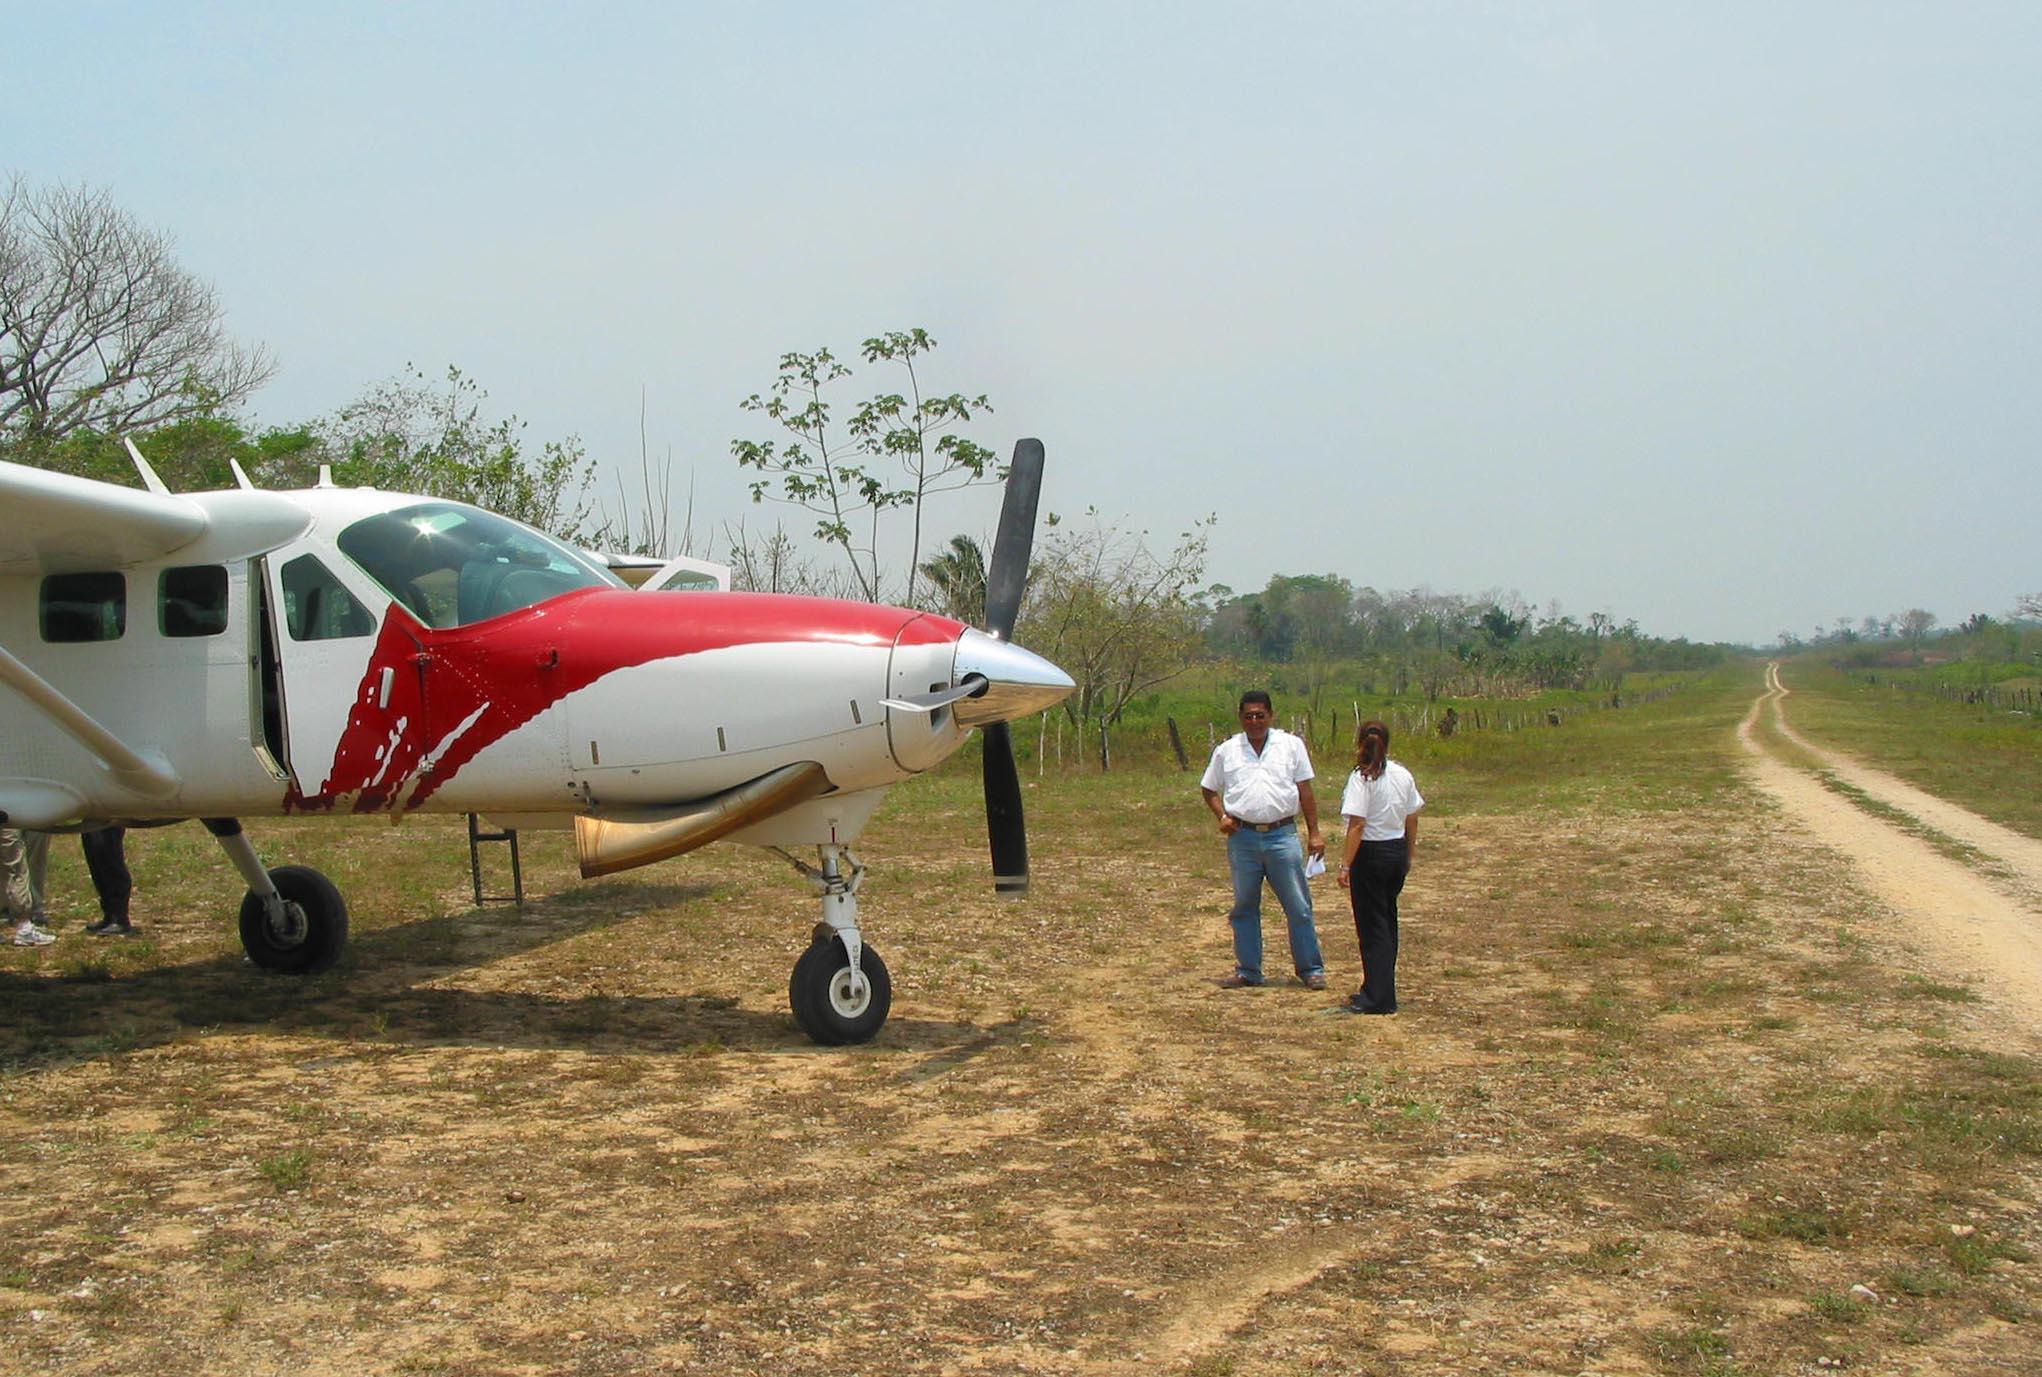 After landing in La Tecnica